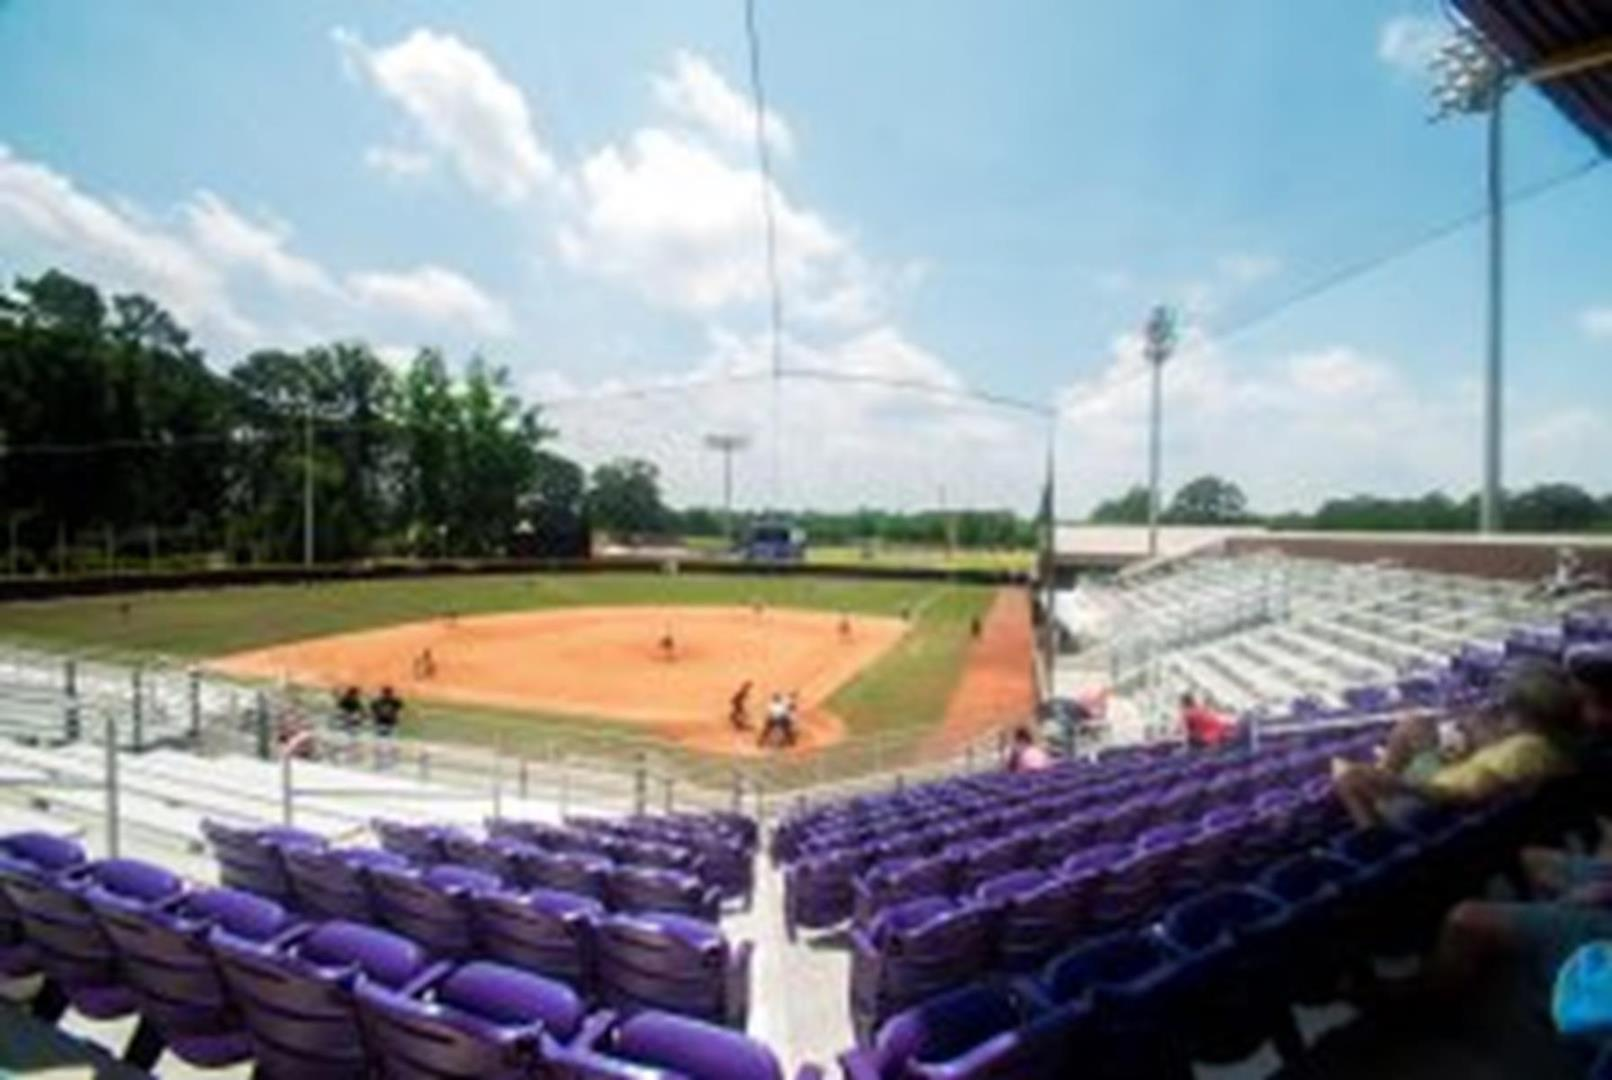 ECU Softball Stadium_GreenvilleNC